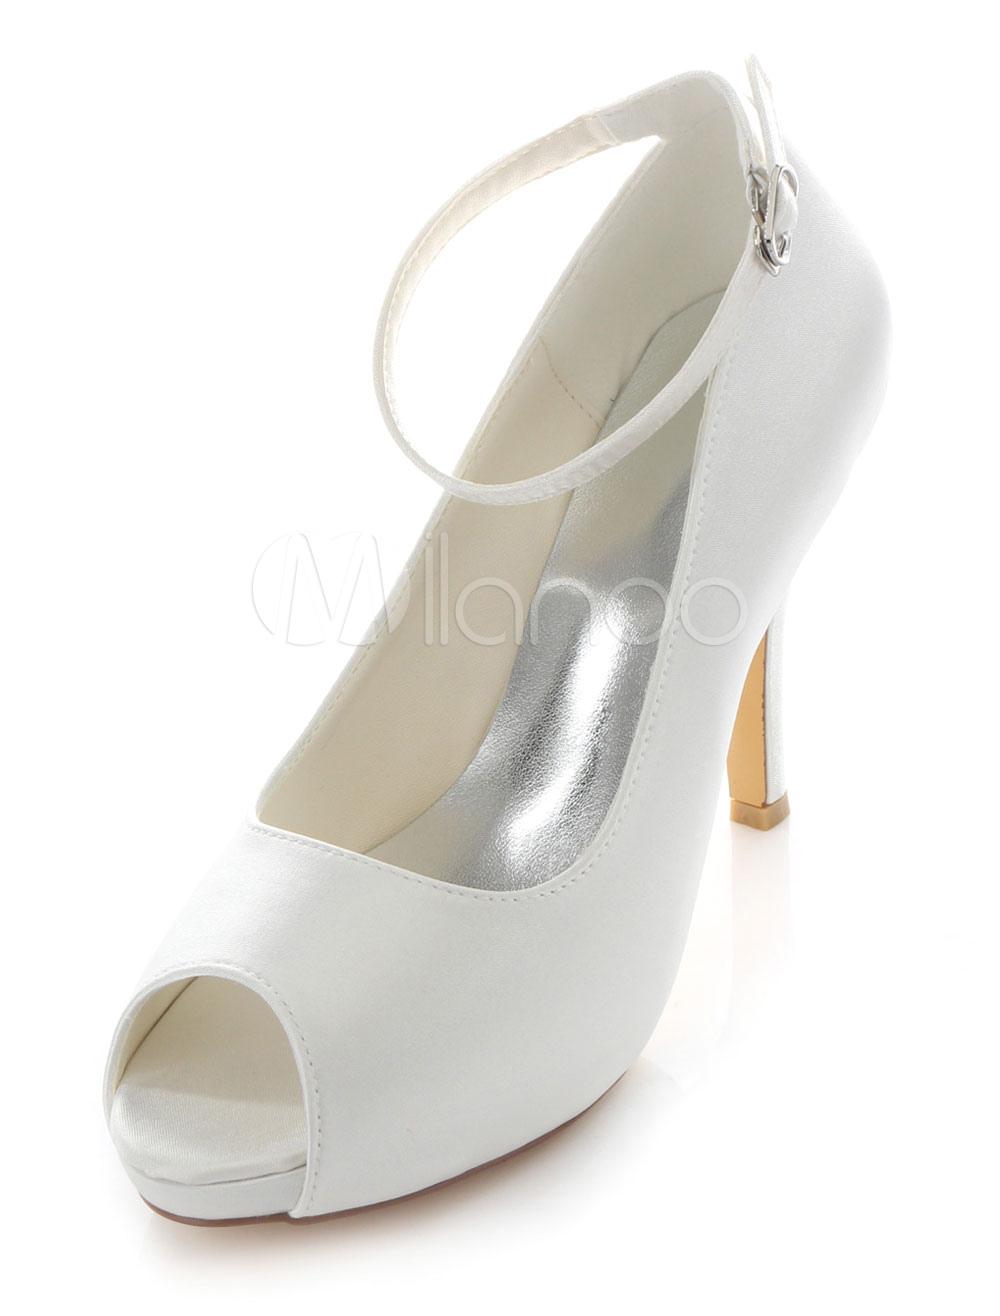 Buy Peep Toe Bridal Pumps White Satin Wedding Heels for Women for $56.69 in Milanoo store